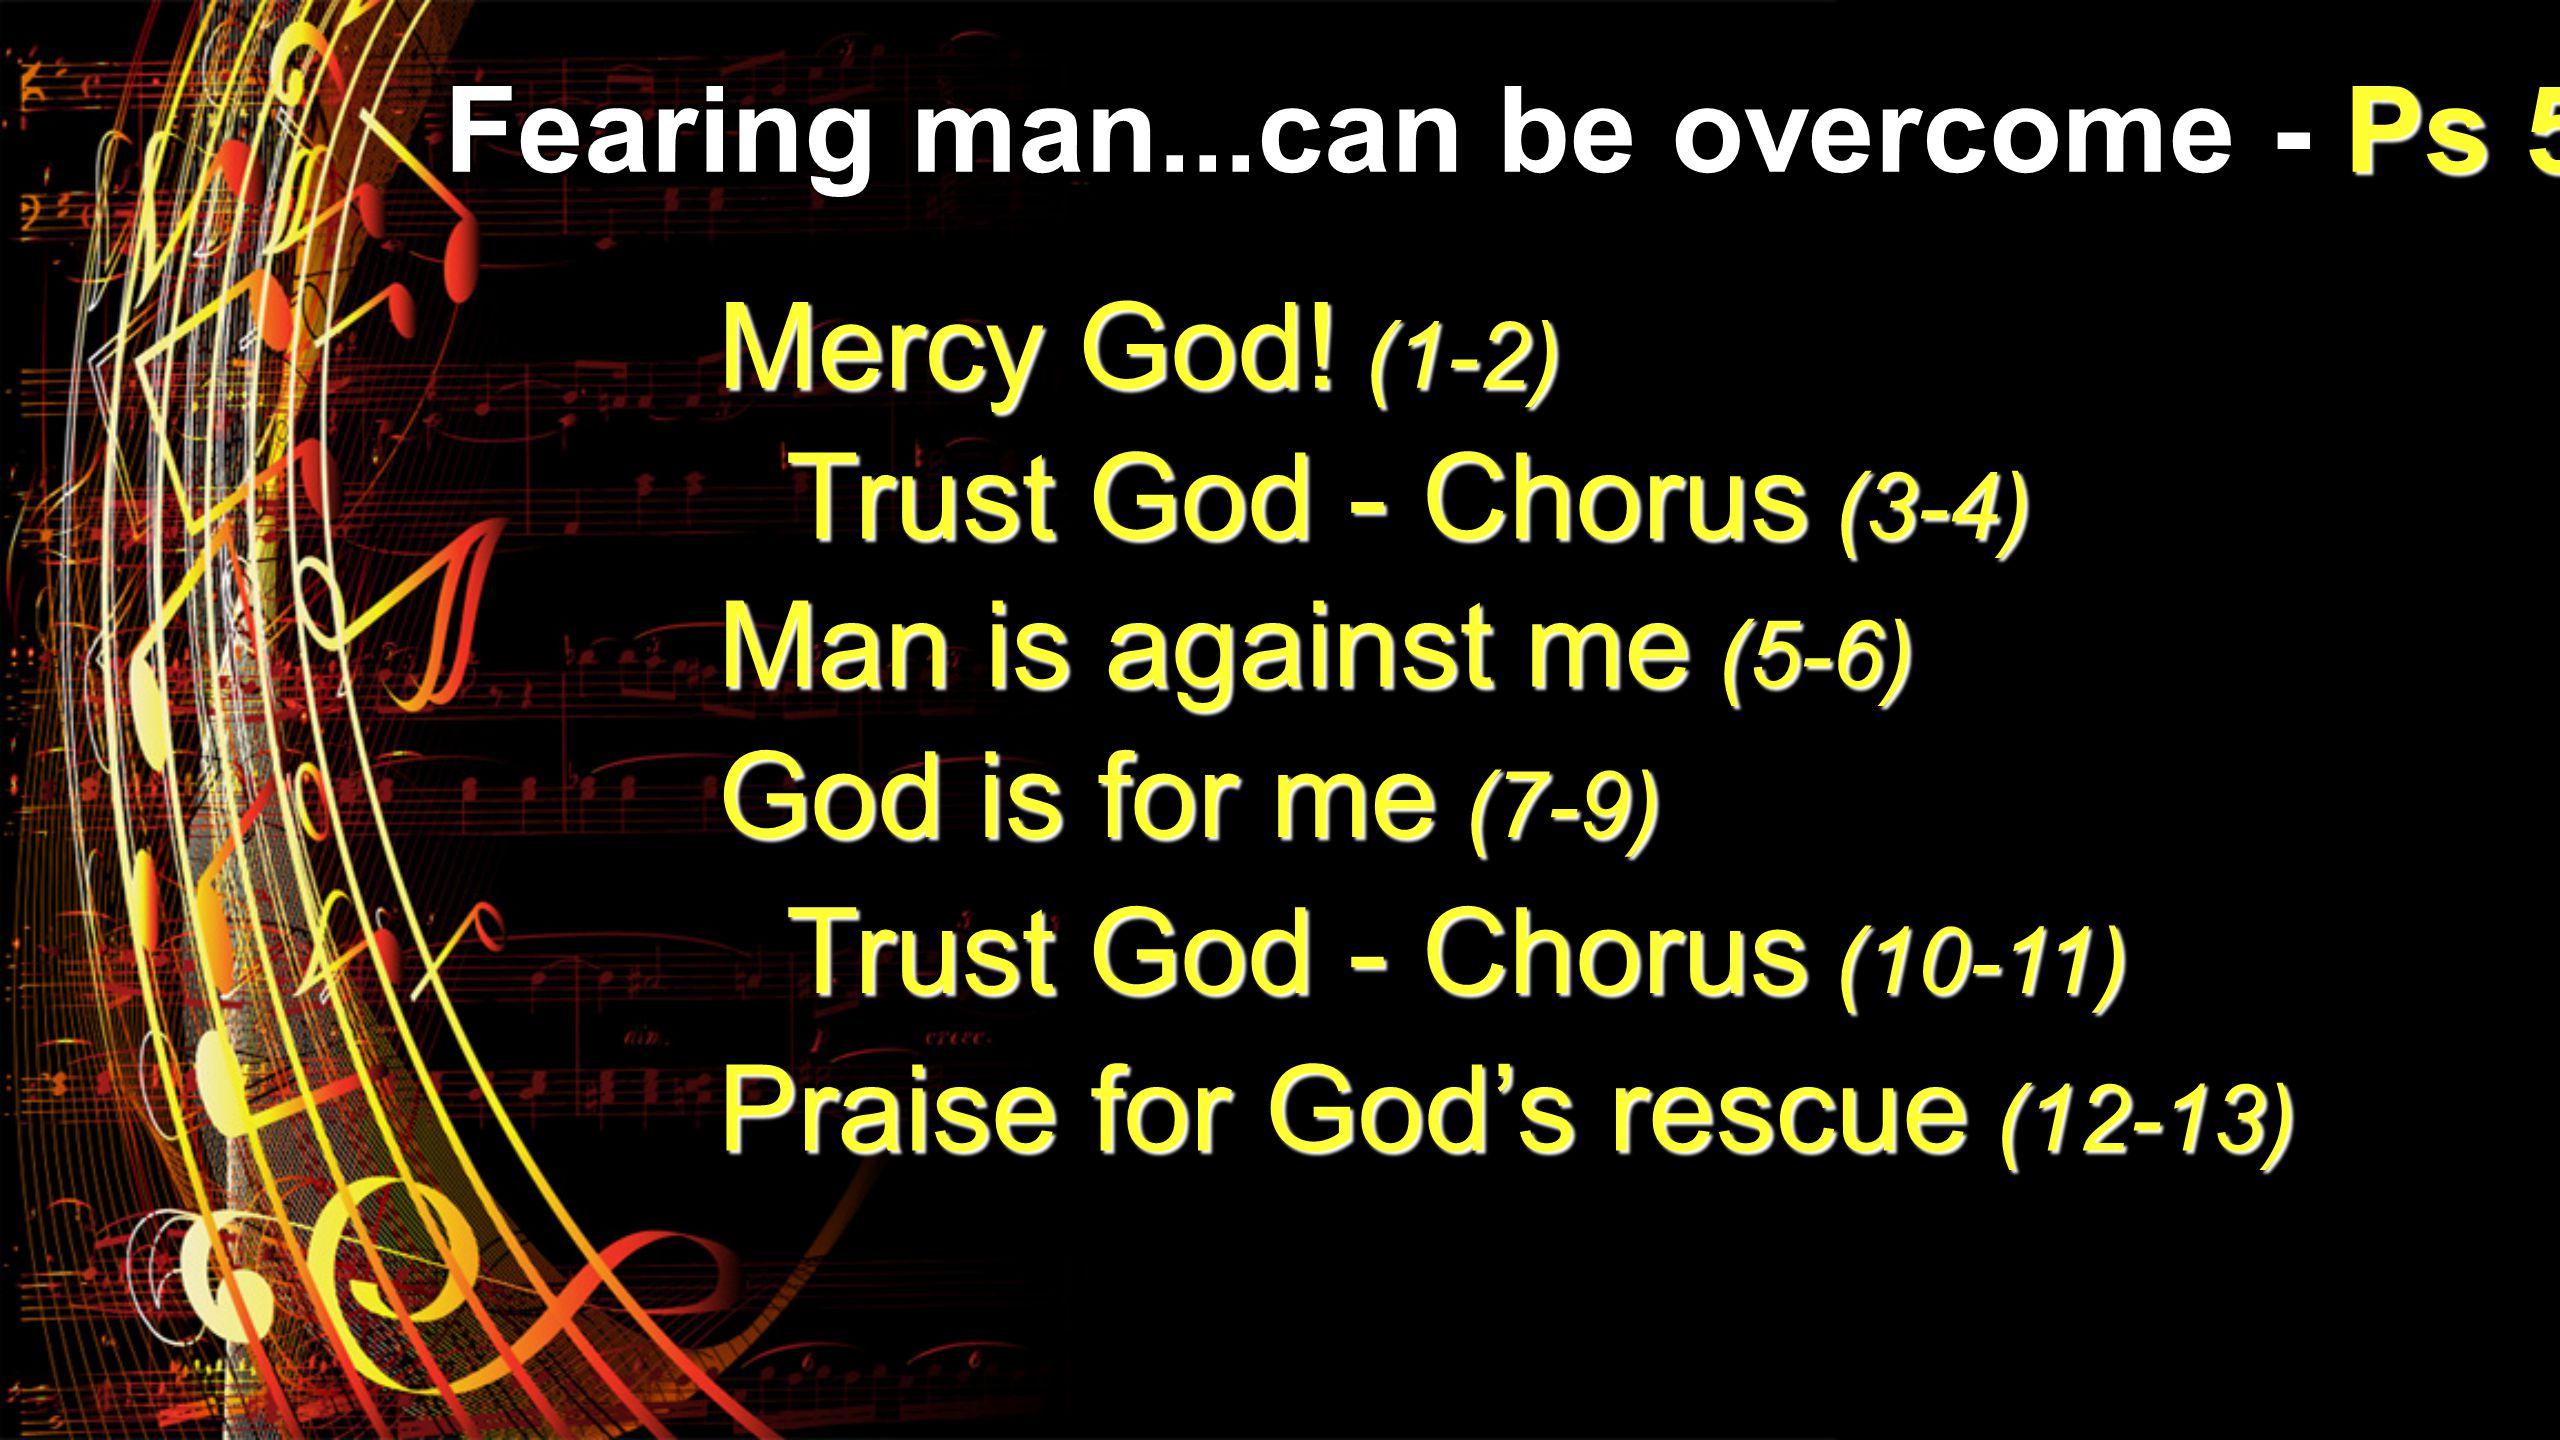 Mercy God! (1-2) Trust God - Chorus (3-4) Man is against me (5-6) God is for me (7-9) Trust God - Chorus (10-11) Praise for Gods rescue (12-13)